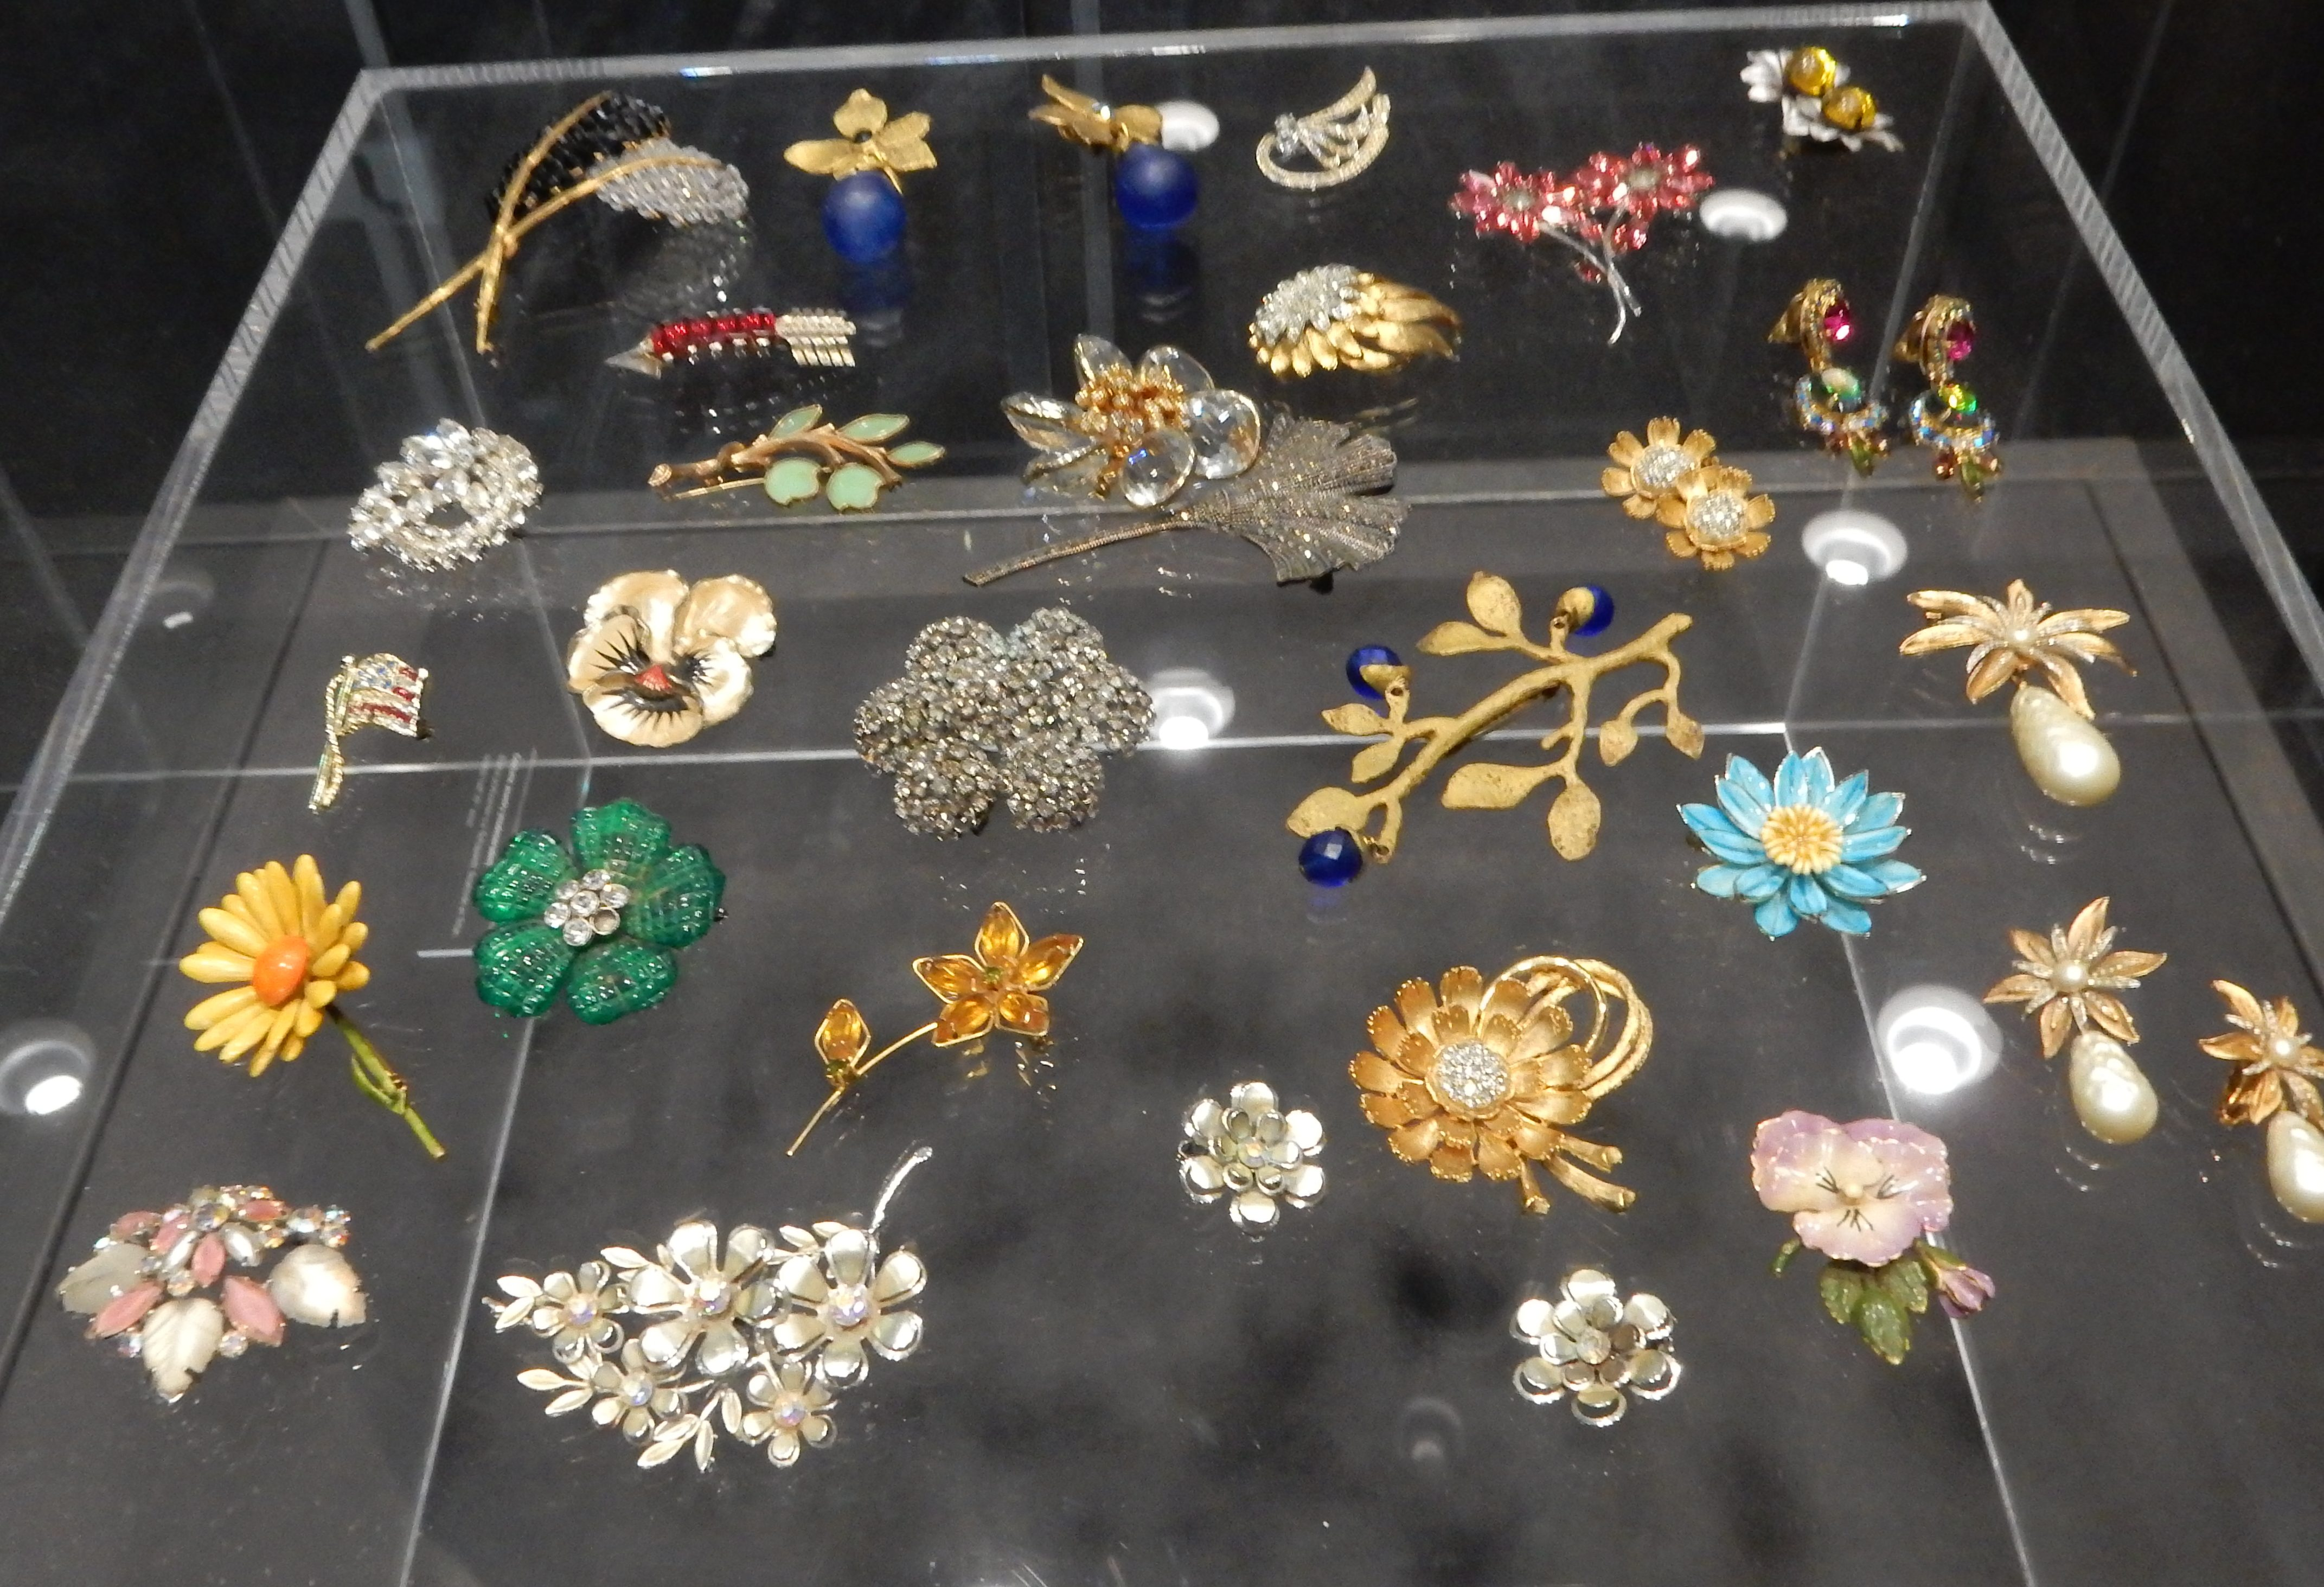 Costume jewellery. Show yourself, Design Museum Den Bosch, 2018, Collectie Yvònne Joris (2018 Collectie DMDB). Foto Esther Doornbusch, 28 augustus 2018, CC BY 4.0